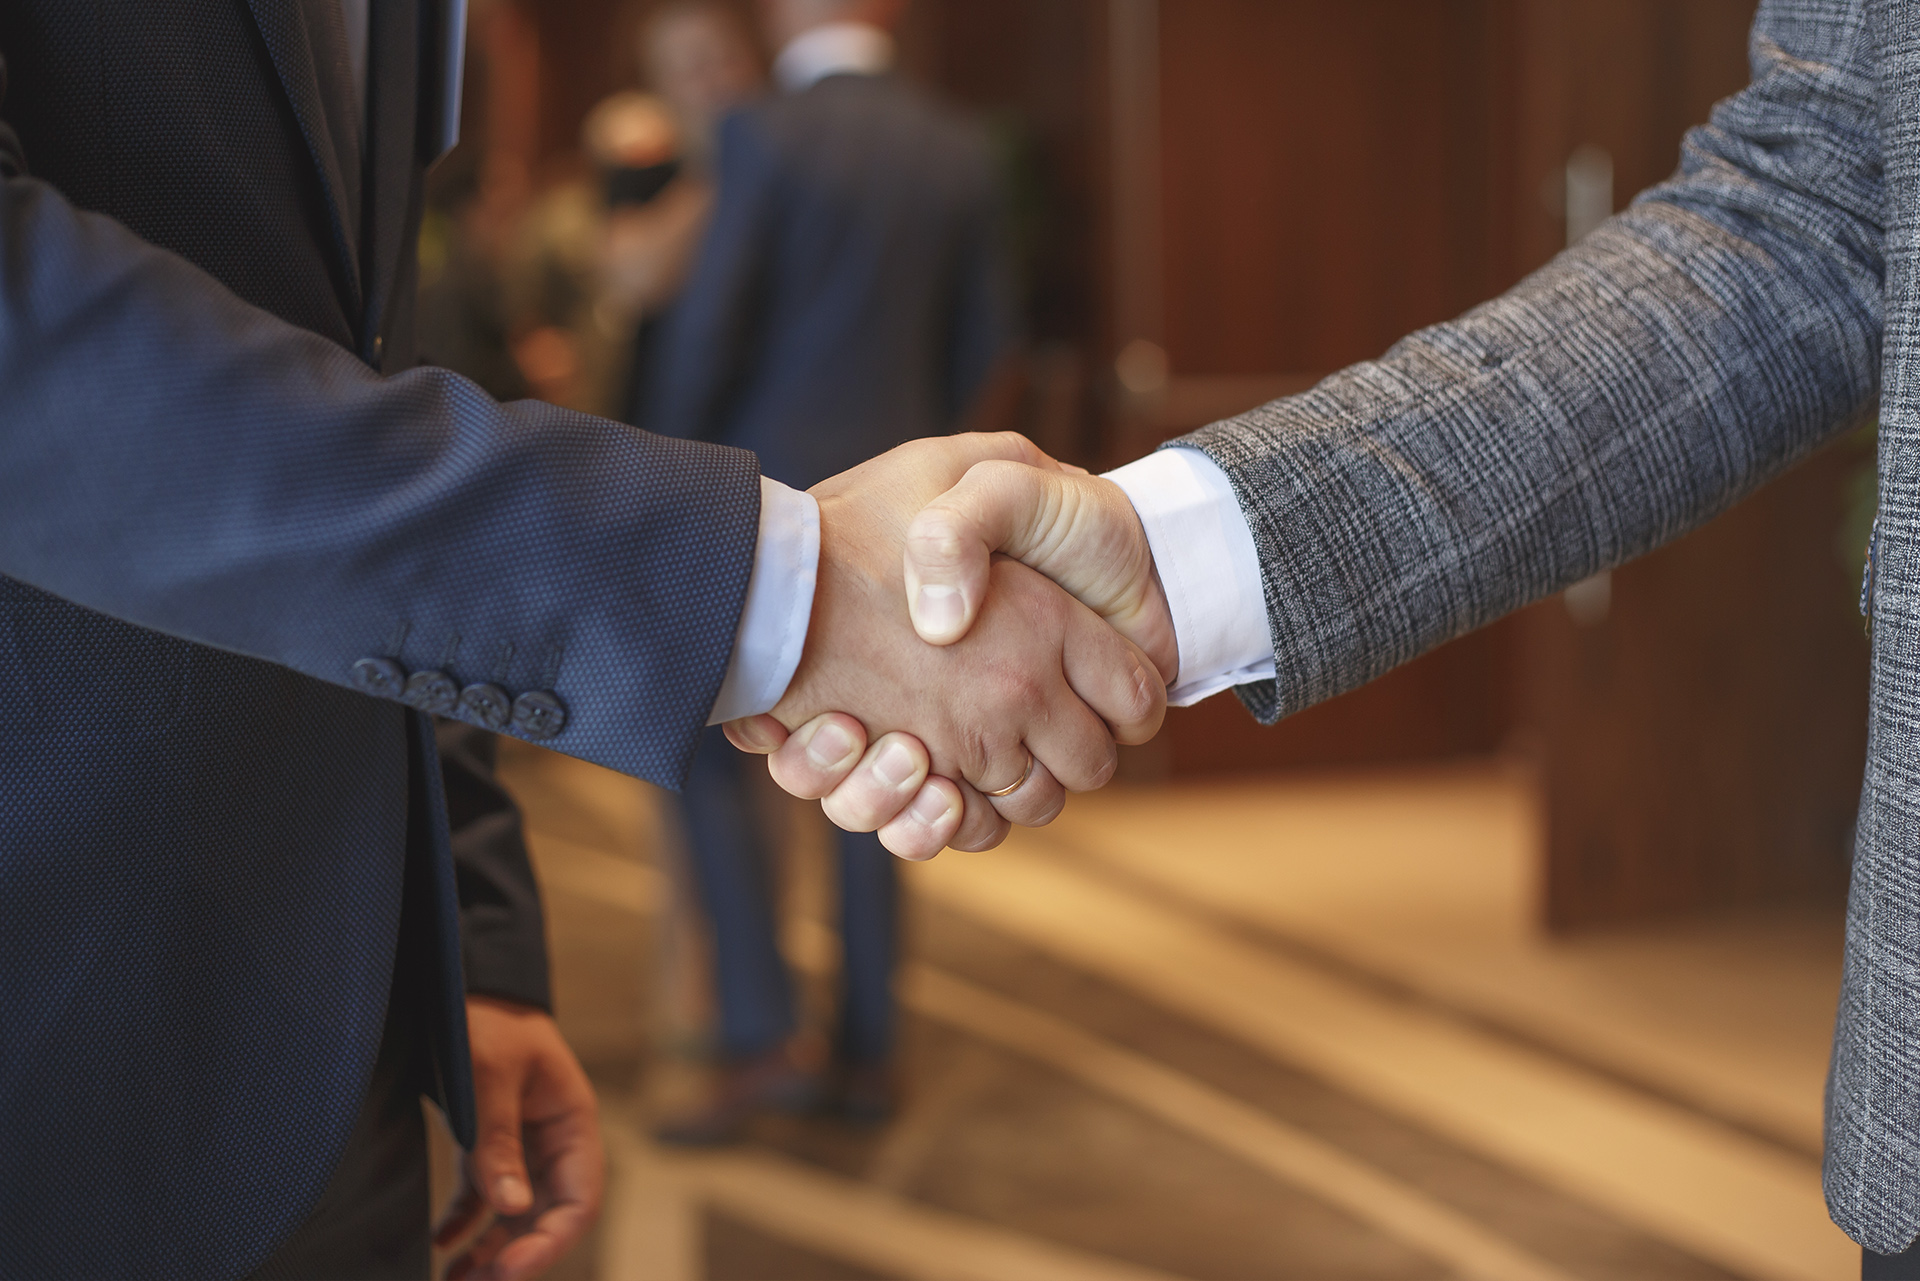 handshake after fair dispute resolution